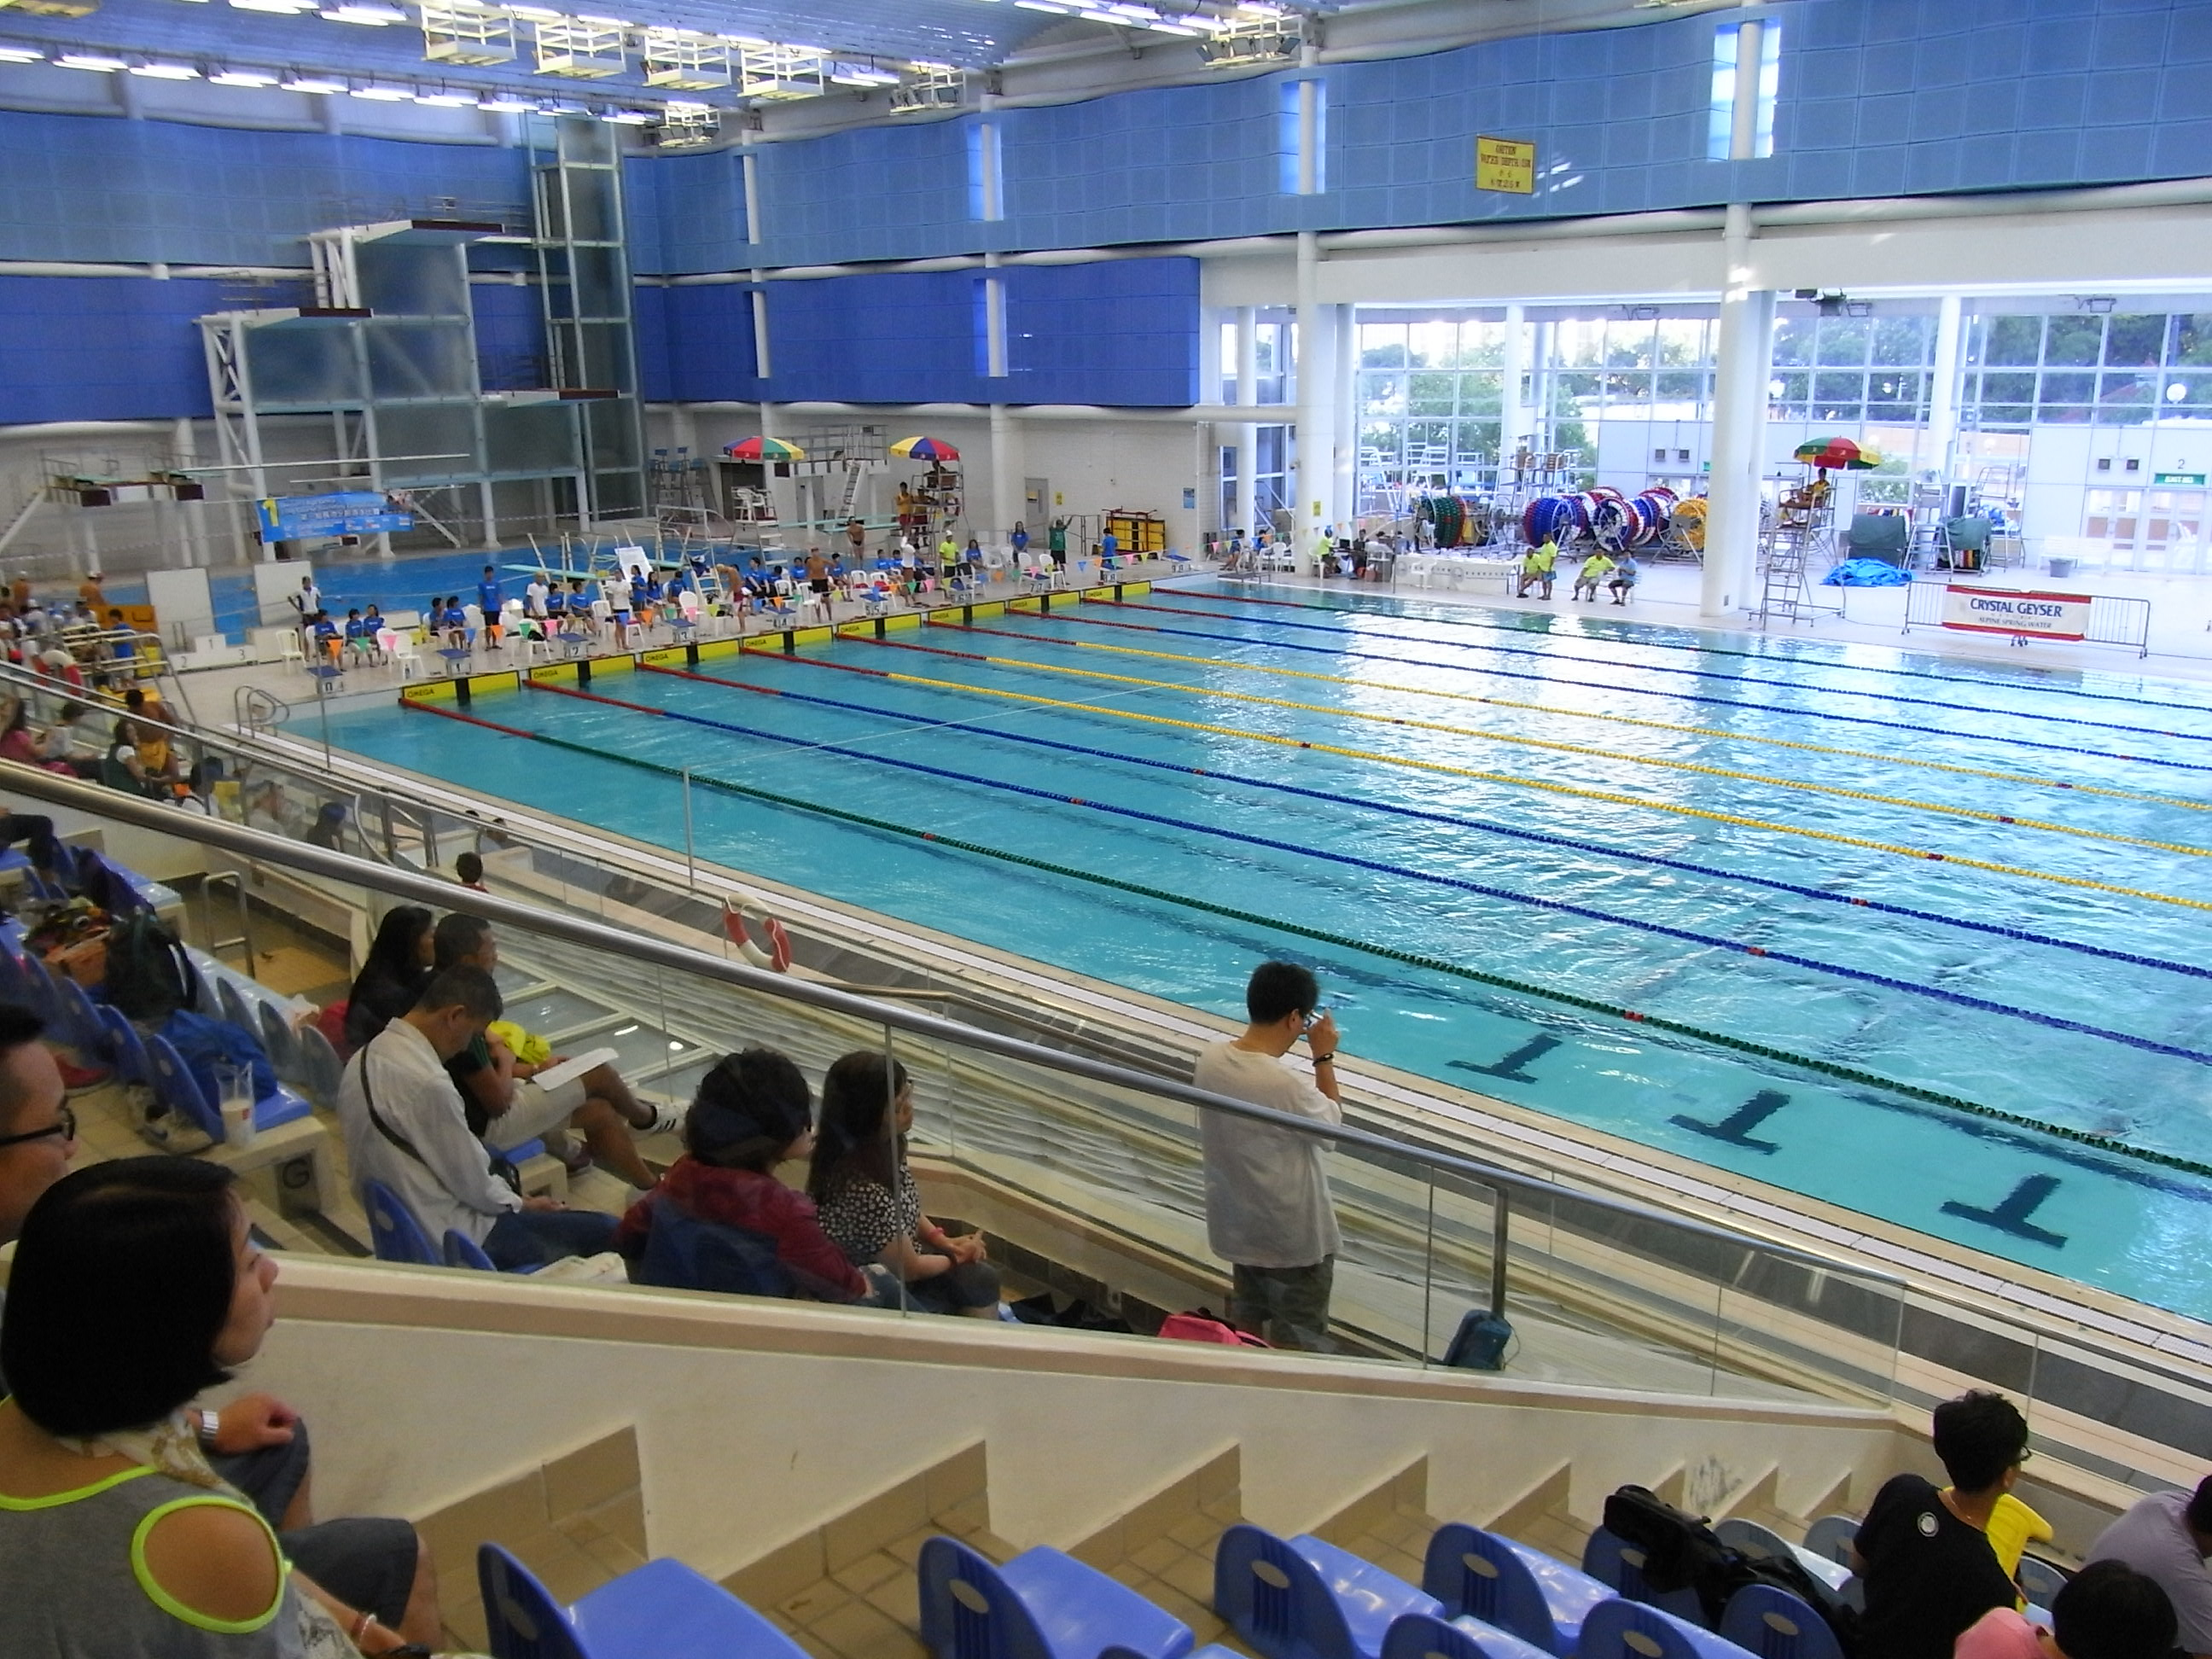 File Hk Tst Kln Park Swimming Pool 03 Indoor July 2012 Jpg Wikimedia Commons